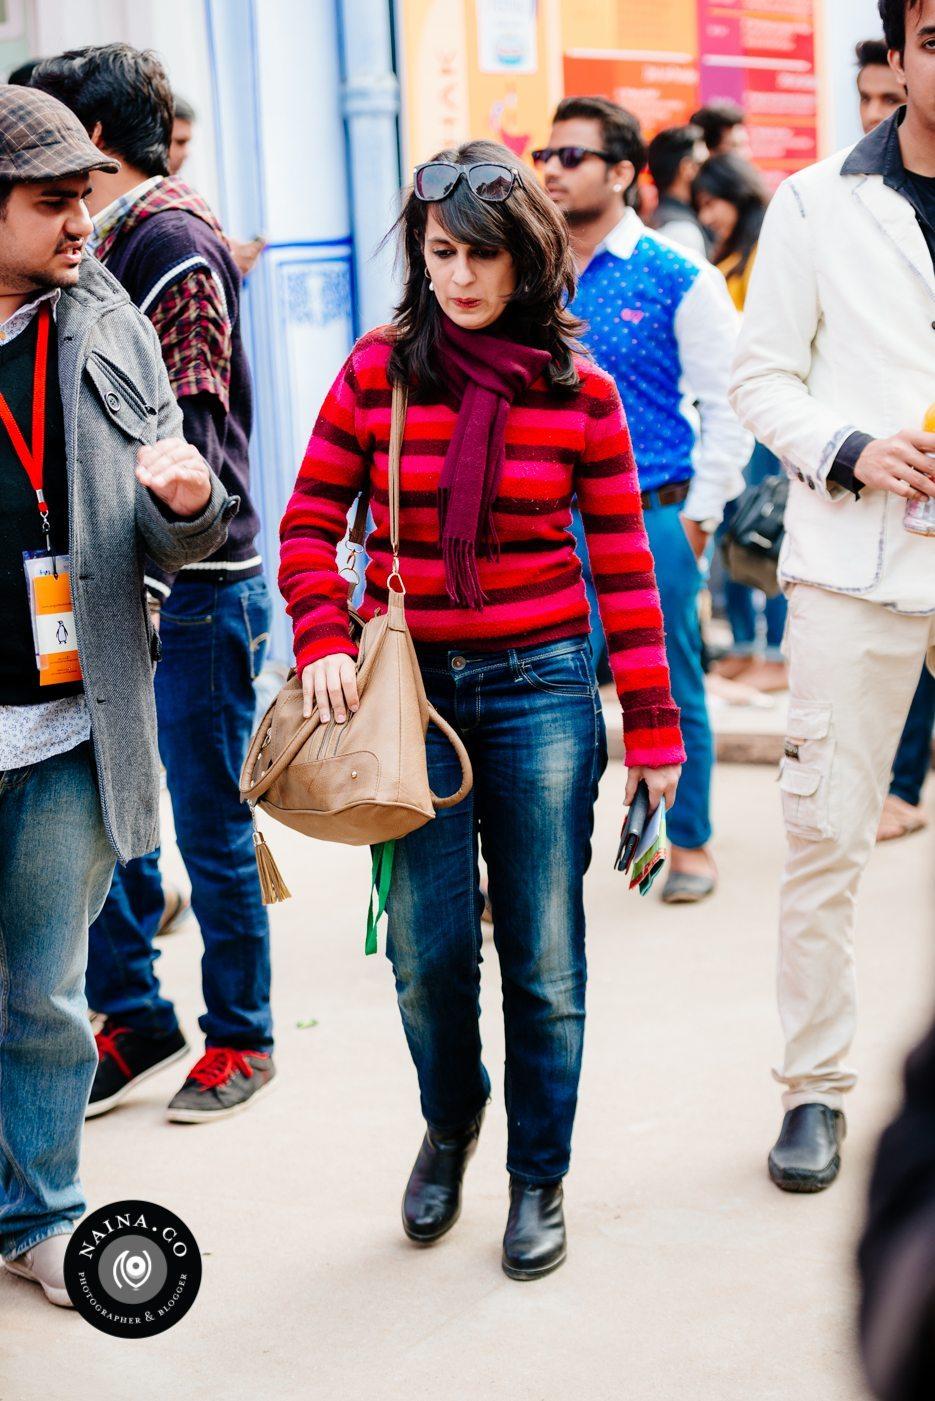 Naina.co-Raconteuse-Visuelle-Photographer-Blogger-Storyteller-Luxury-Lifestyle-January-2015-Jaipur-Literature-Festival-StRegis-LeMeridien-ZeeJLF-EyesForStreetStyle-51